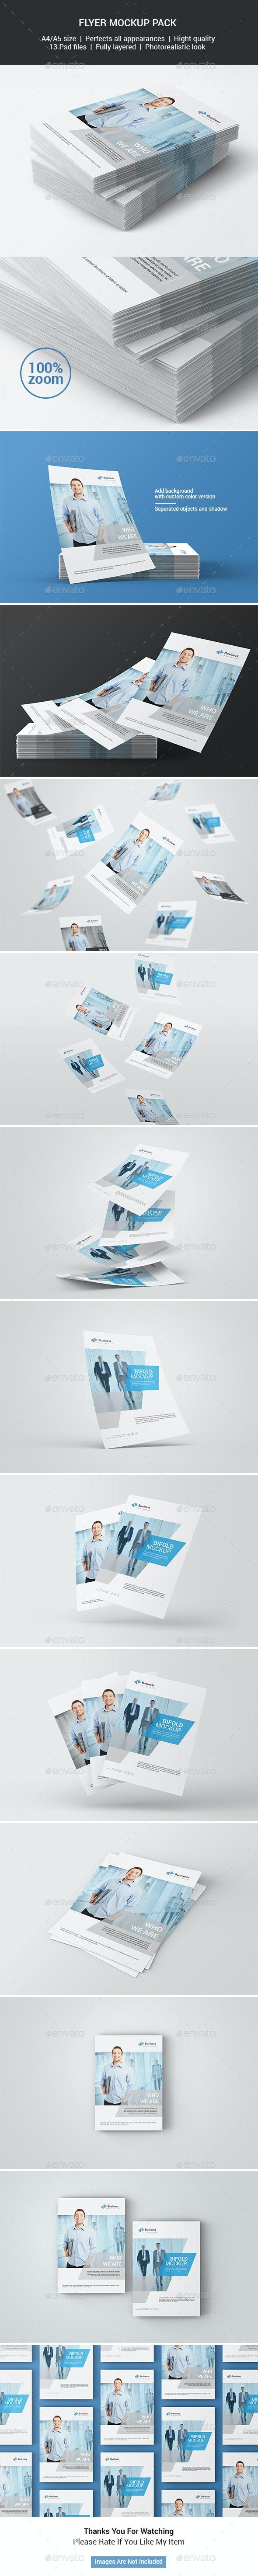 A4 / A5 Flyer Mockup Pack - Print Product Mock-Ups